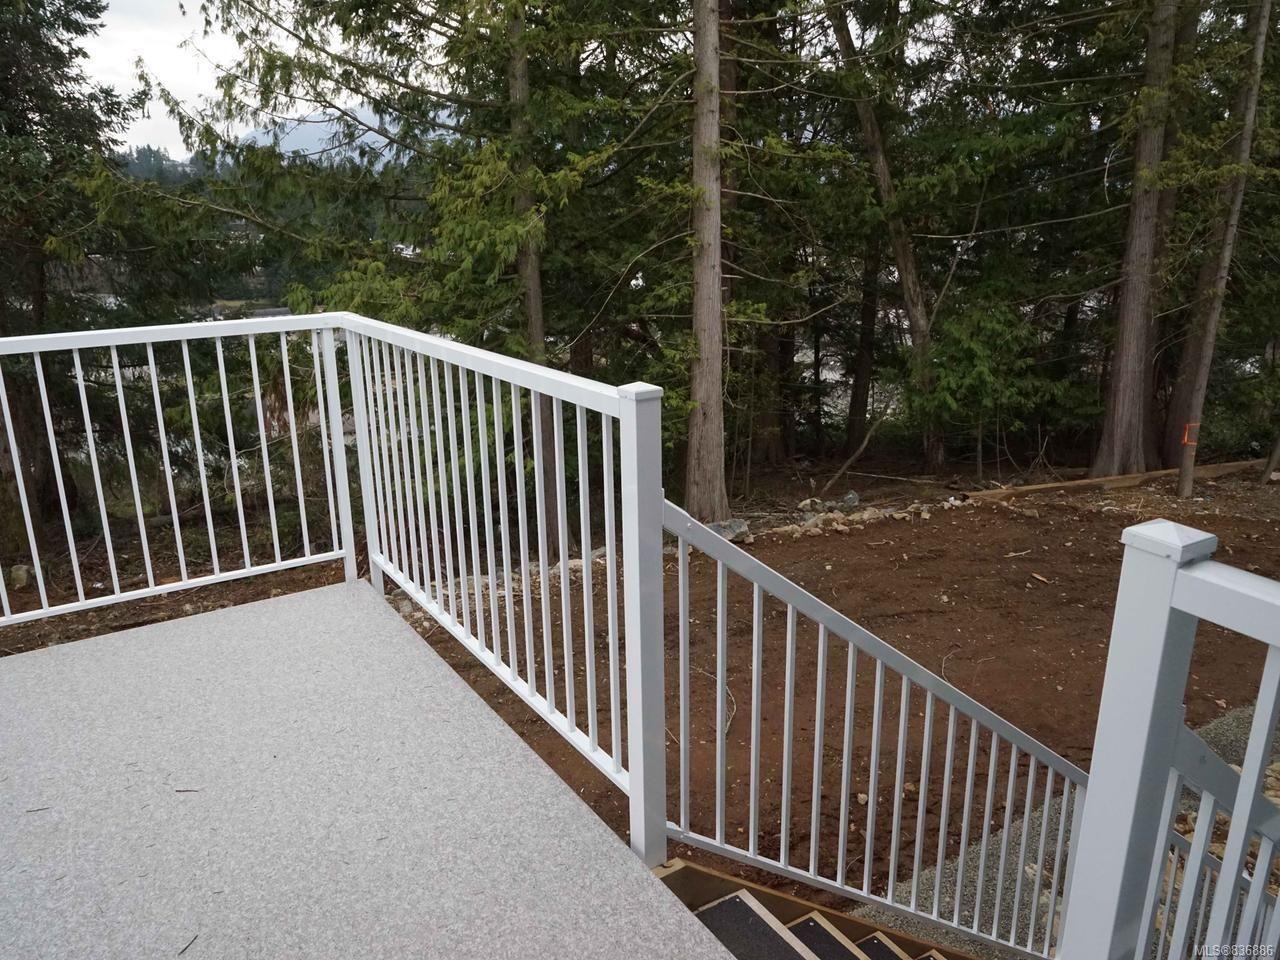 Photo 4: Photos: 123 Lindquist Rd in NANAIMO: Na North Nanaimo House for sale (Nanaimo)  : MLS®# 836886